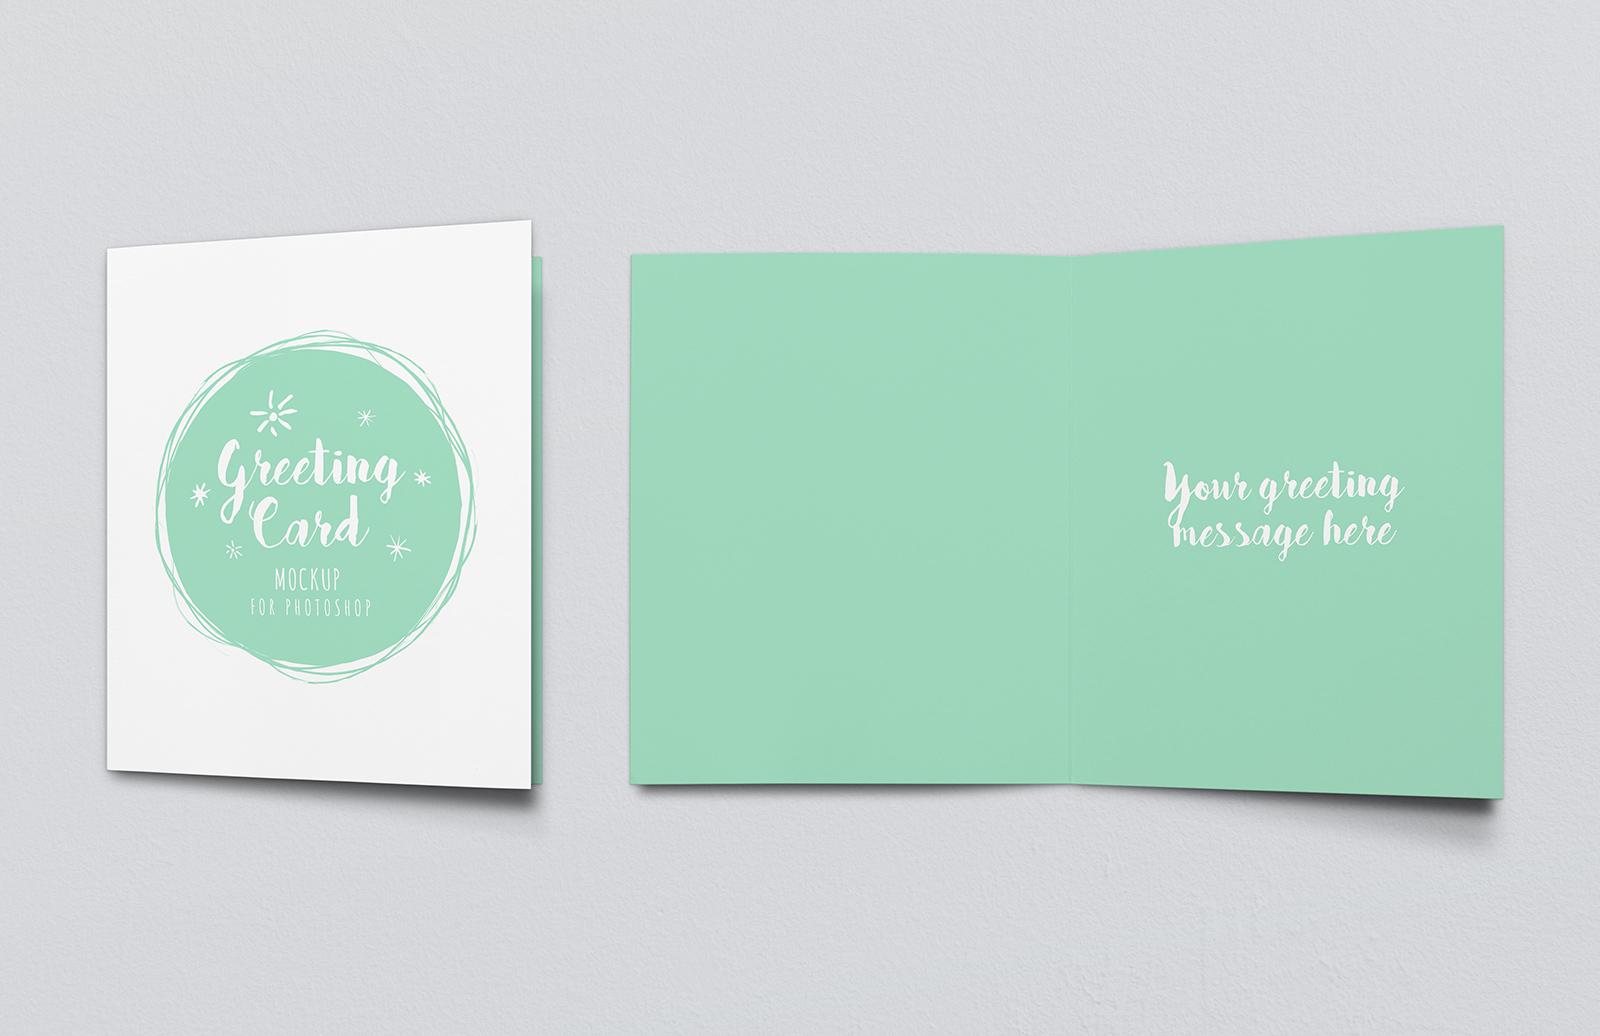 Greeting Card Mockup Vol 2 Preview 1